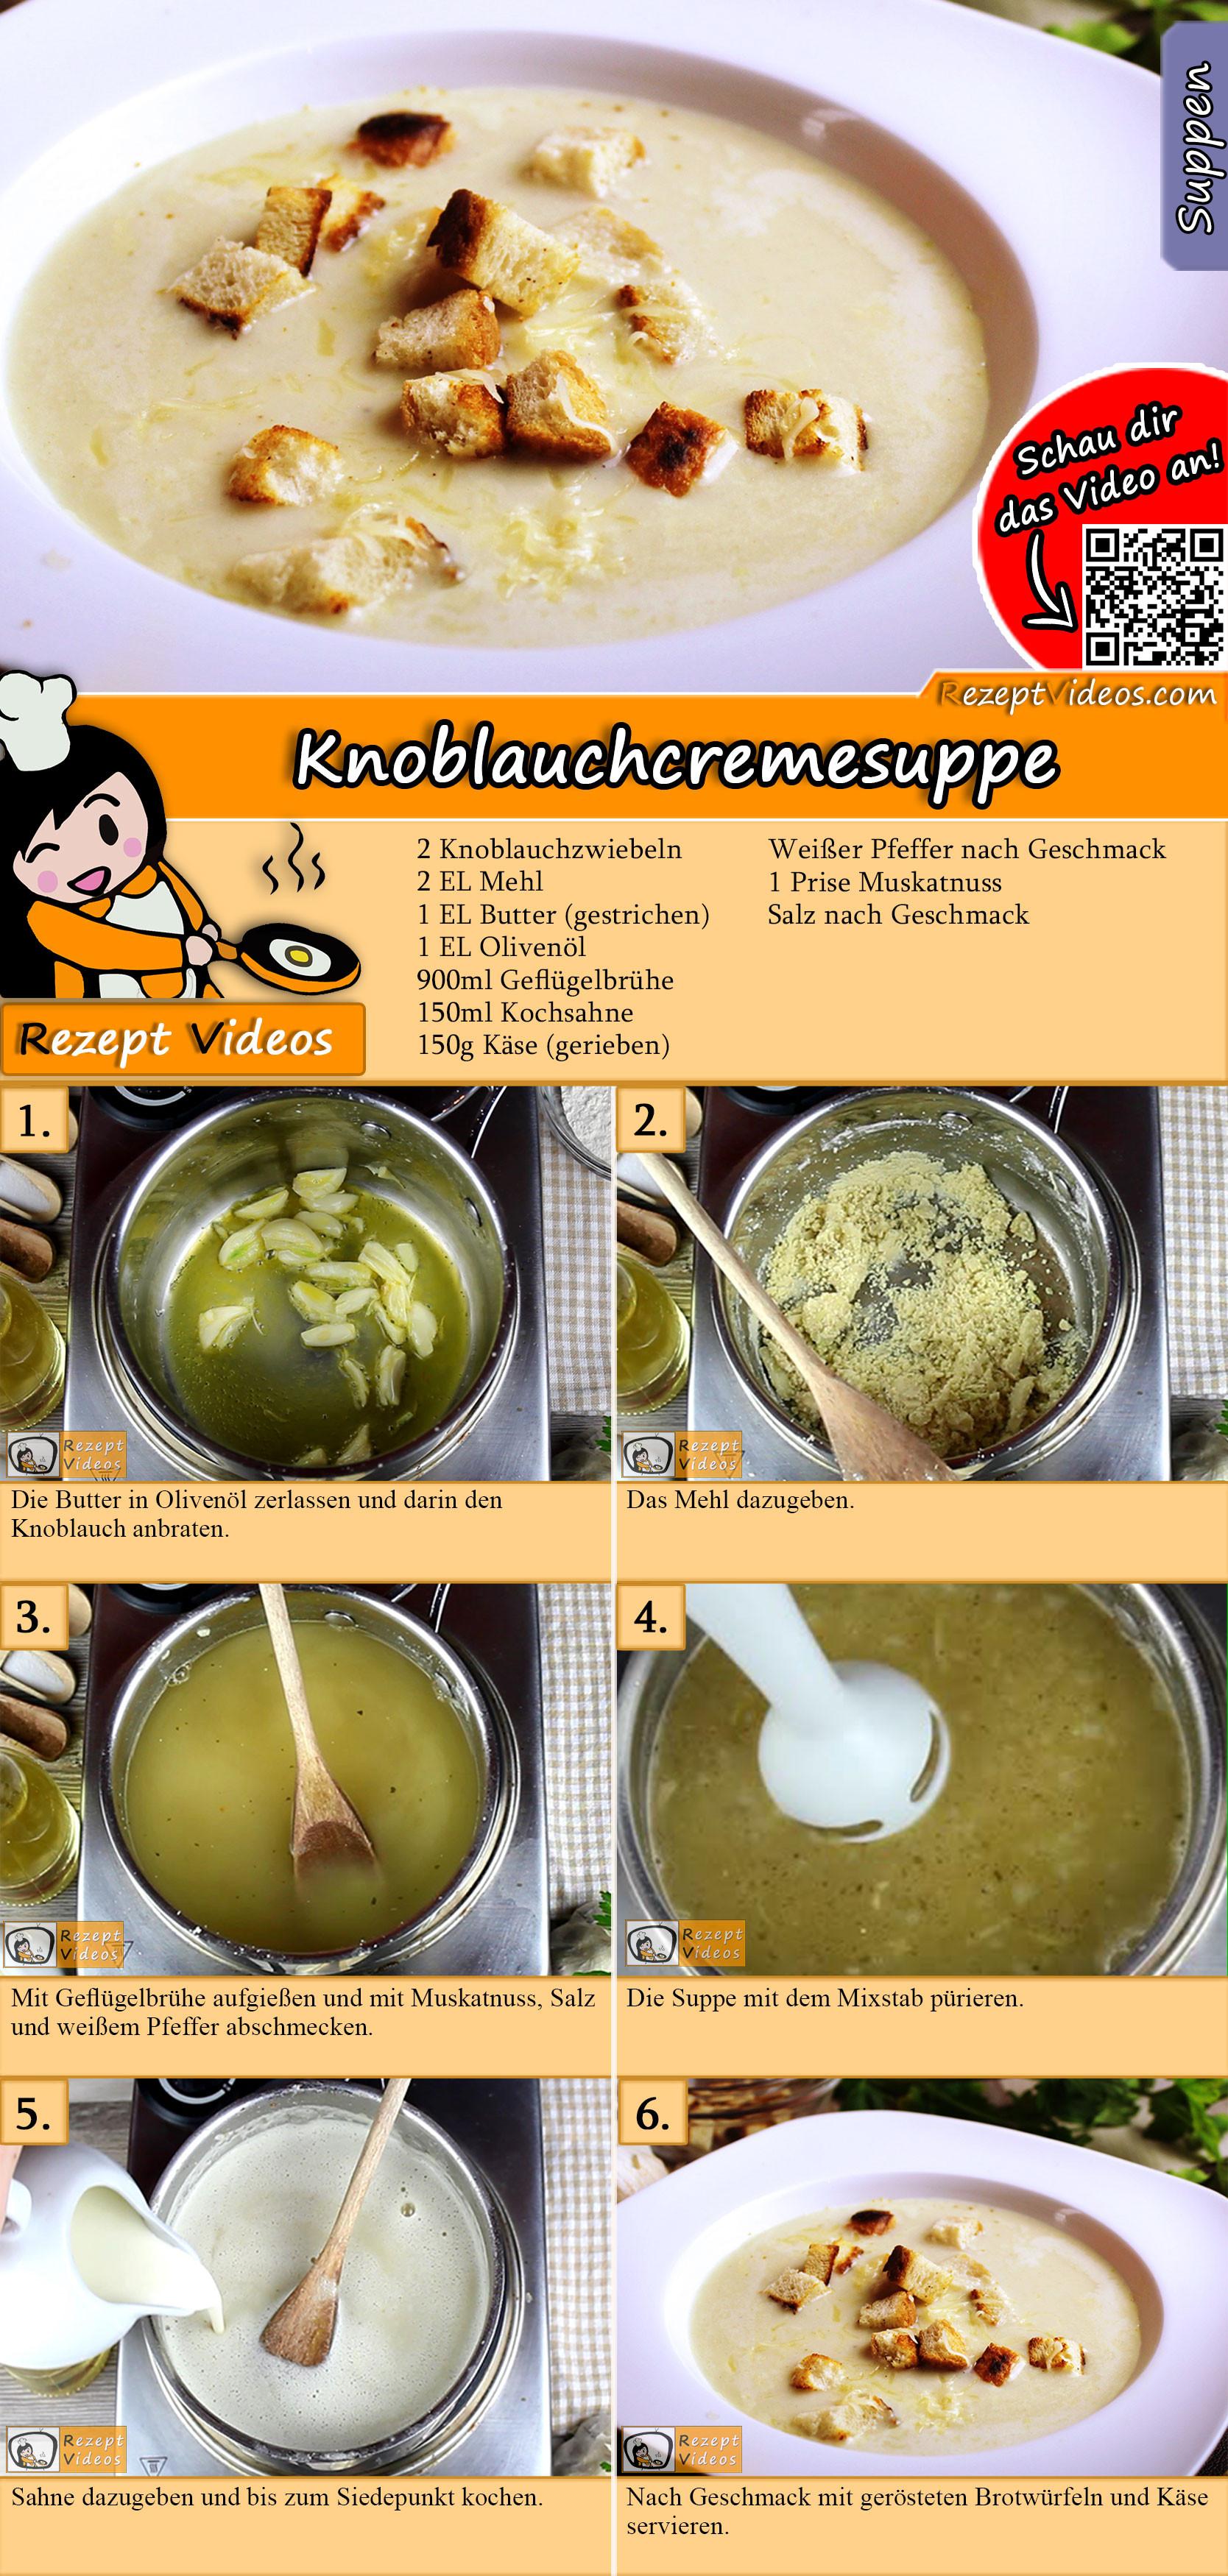 Knoblauchcremesuppe Rezept mit Video